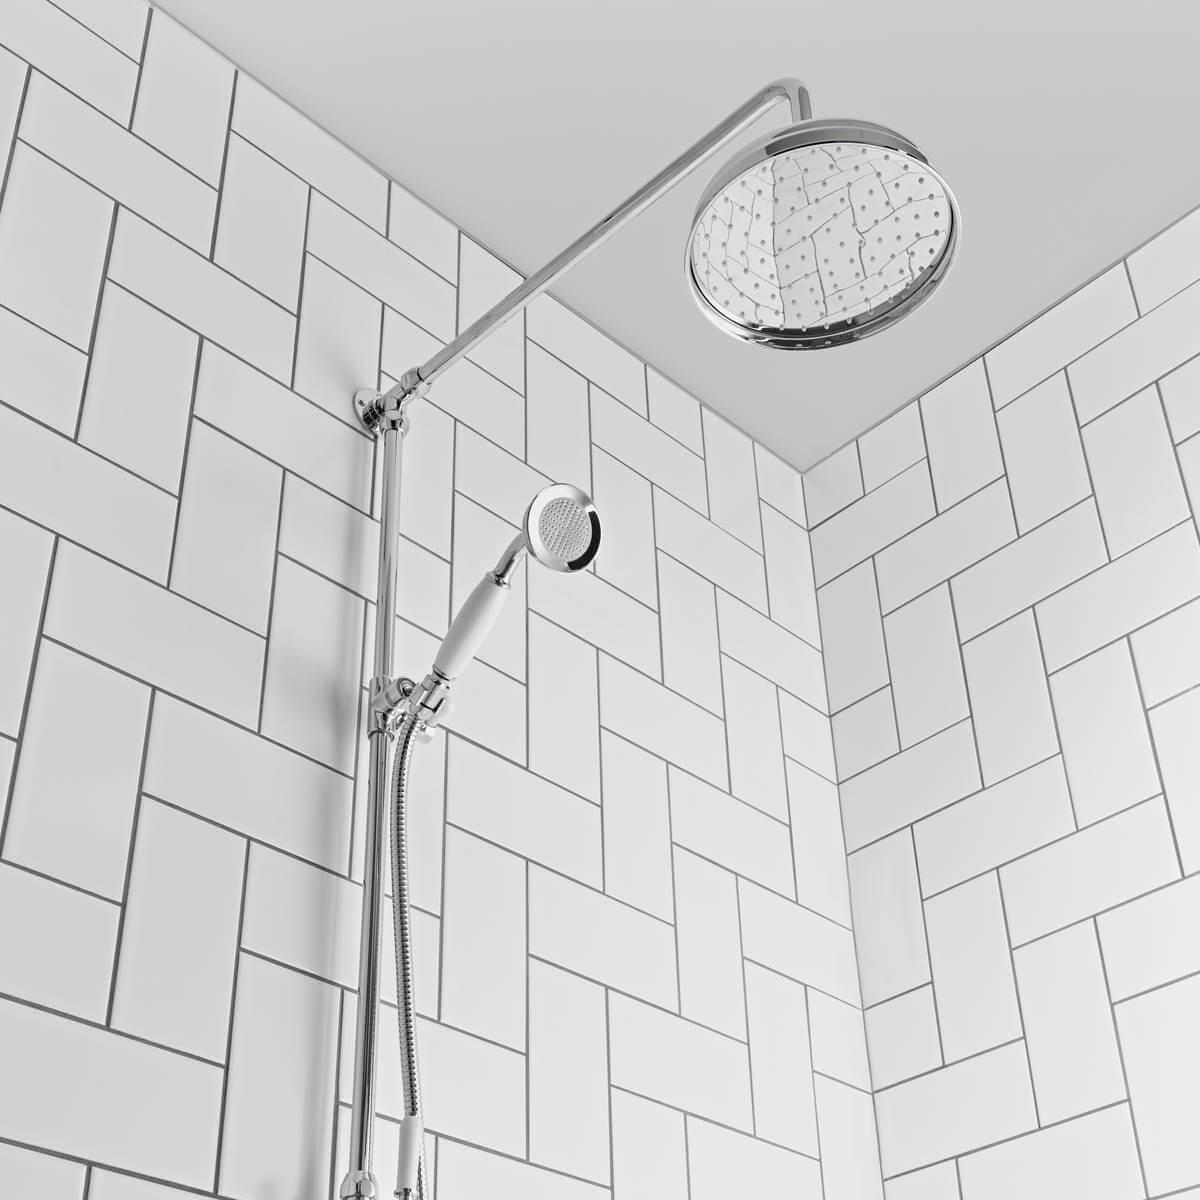 Tavistock Cheltenham Thermostatic Exposed Dual Function Shower System